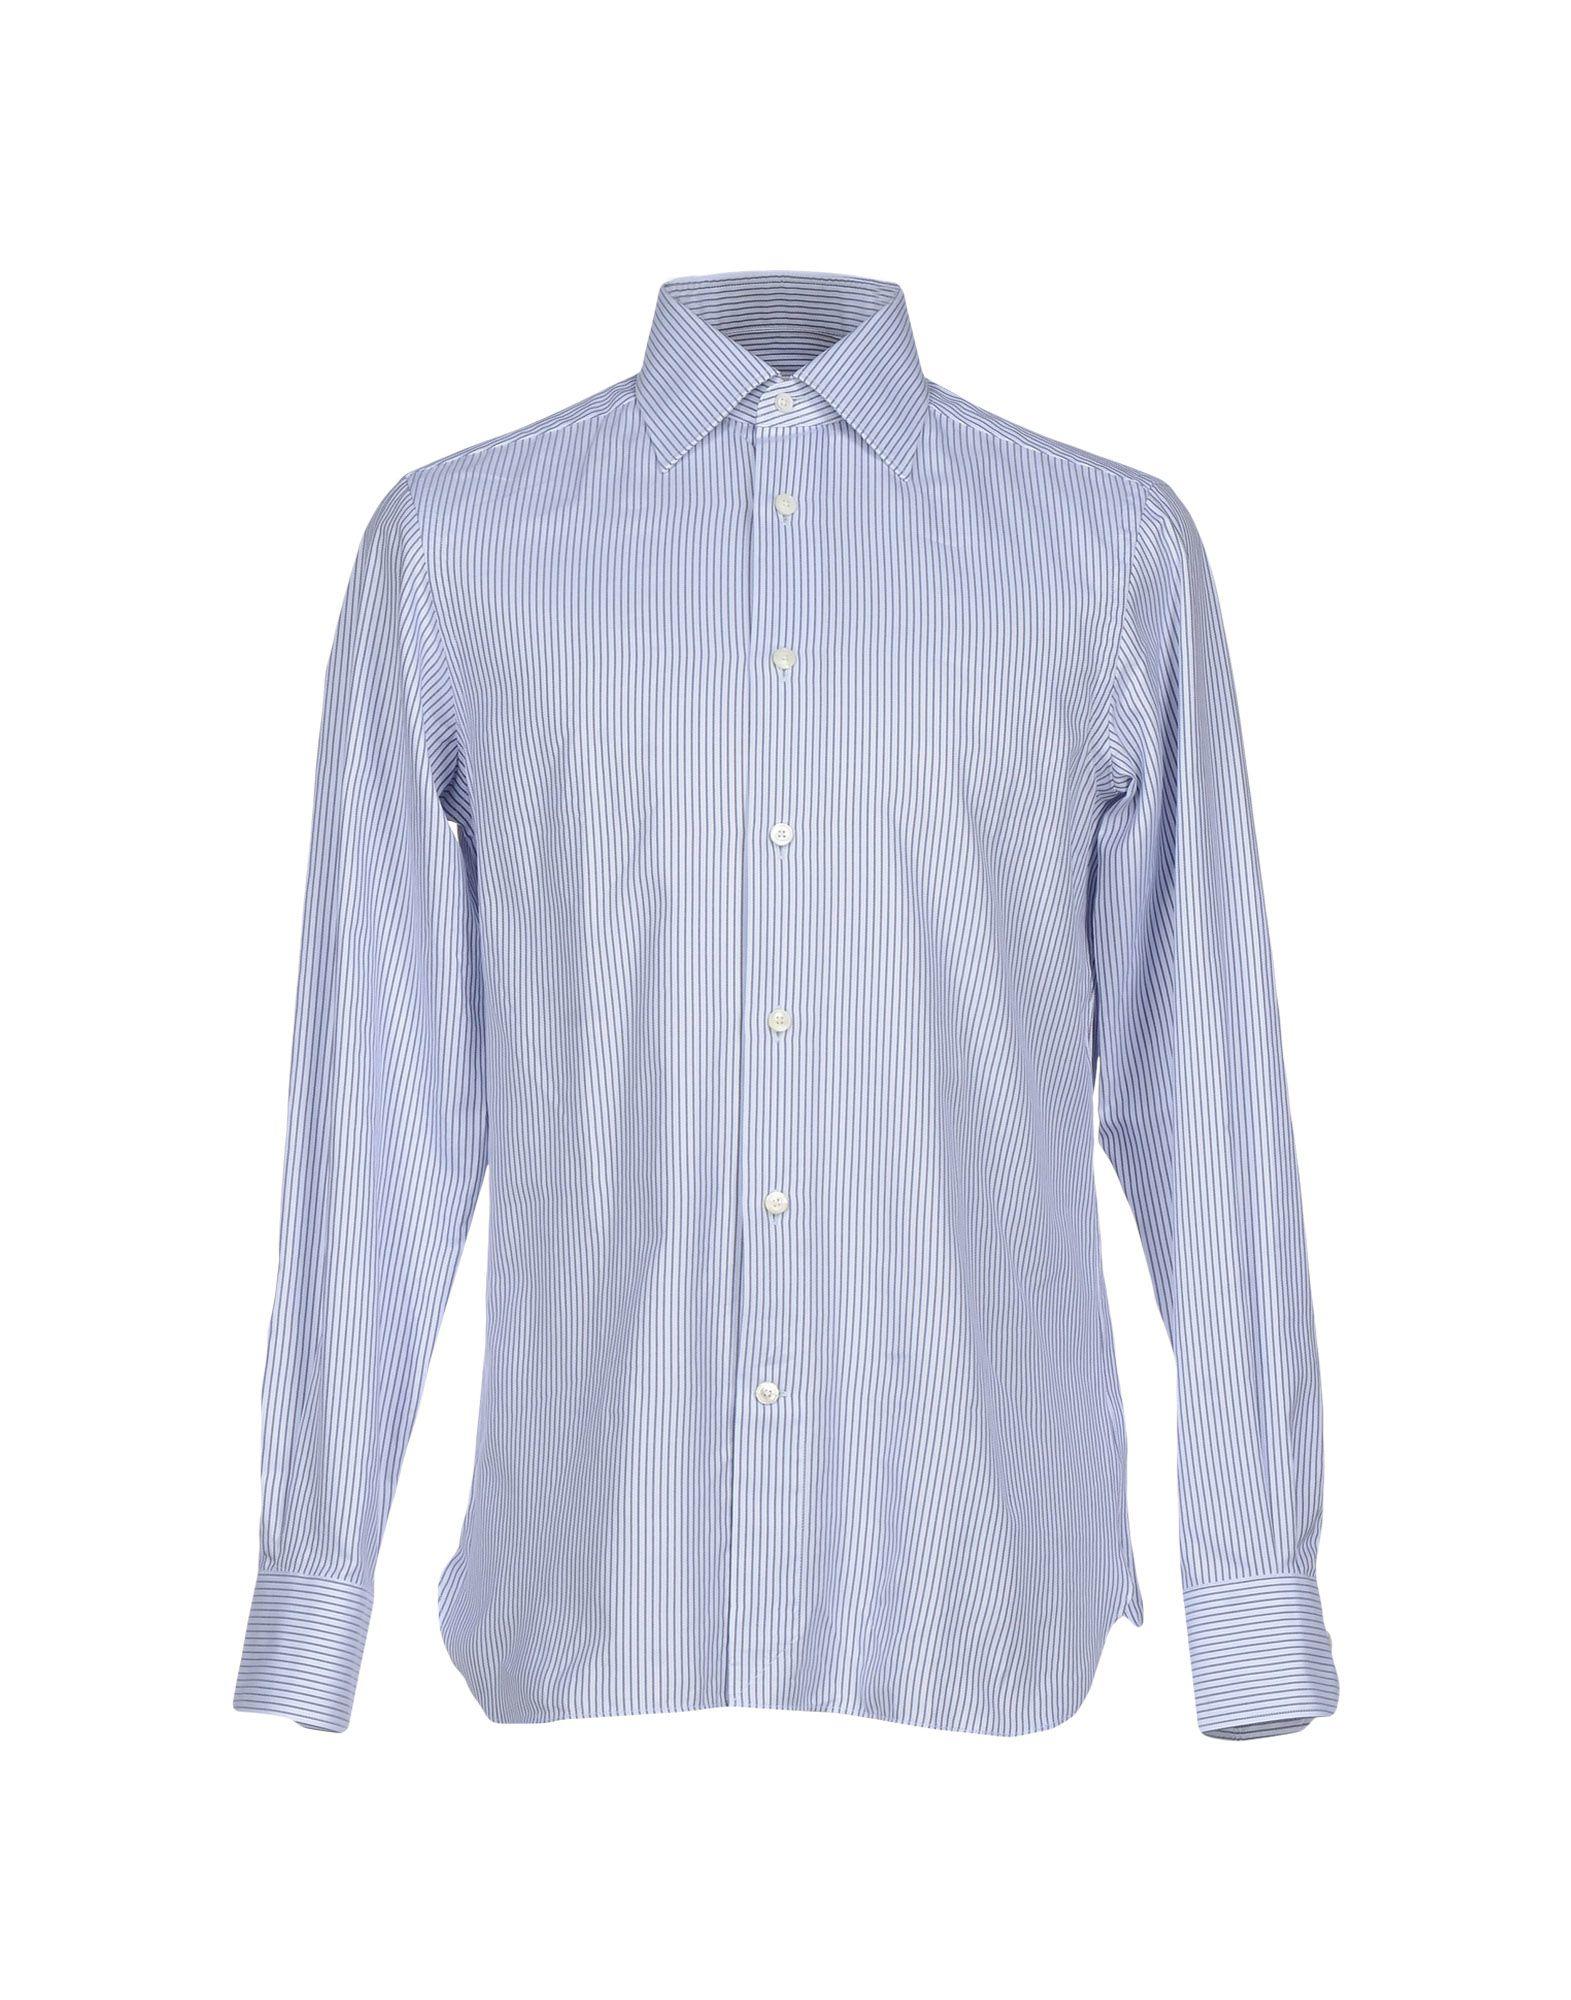 ermenegildo zegna shirt in blue for men grey lyst. Black Bedroom Furniture Sets. Home Design Ideas